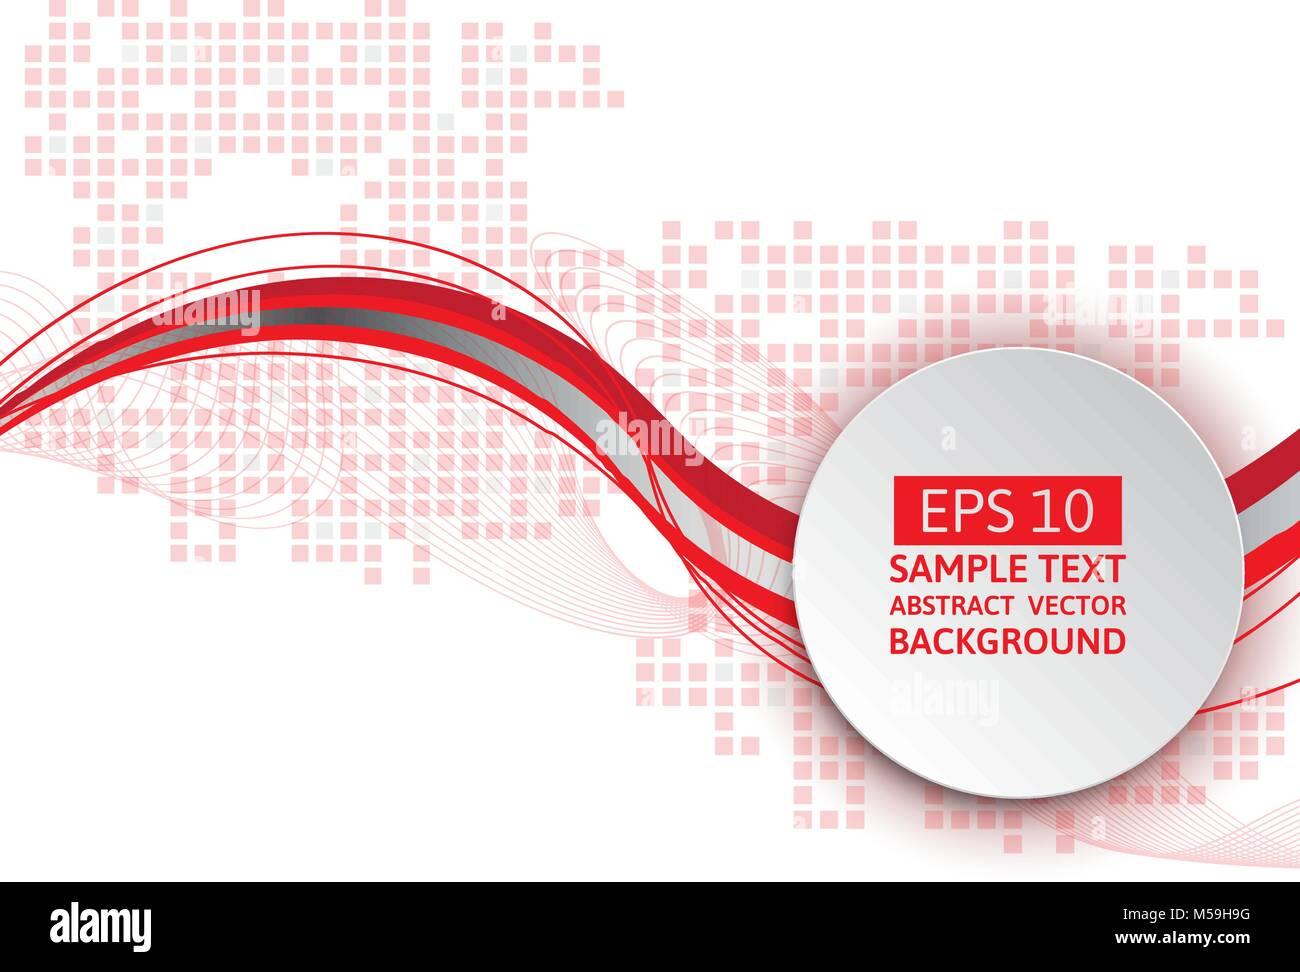 Rote Welle abstract vector Hintergrund, Grafik Design Stockbild